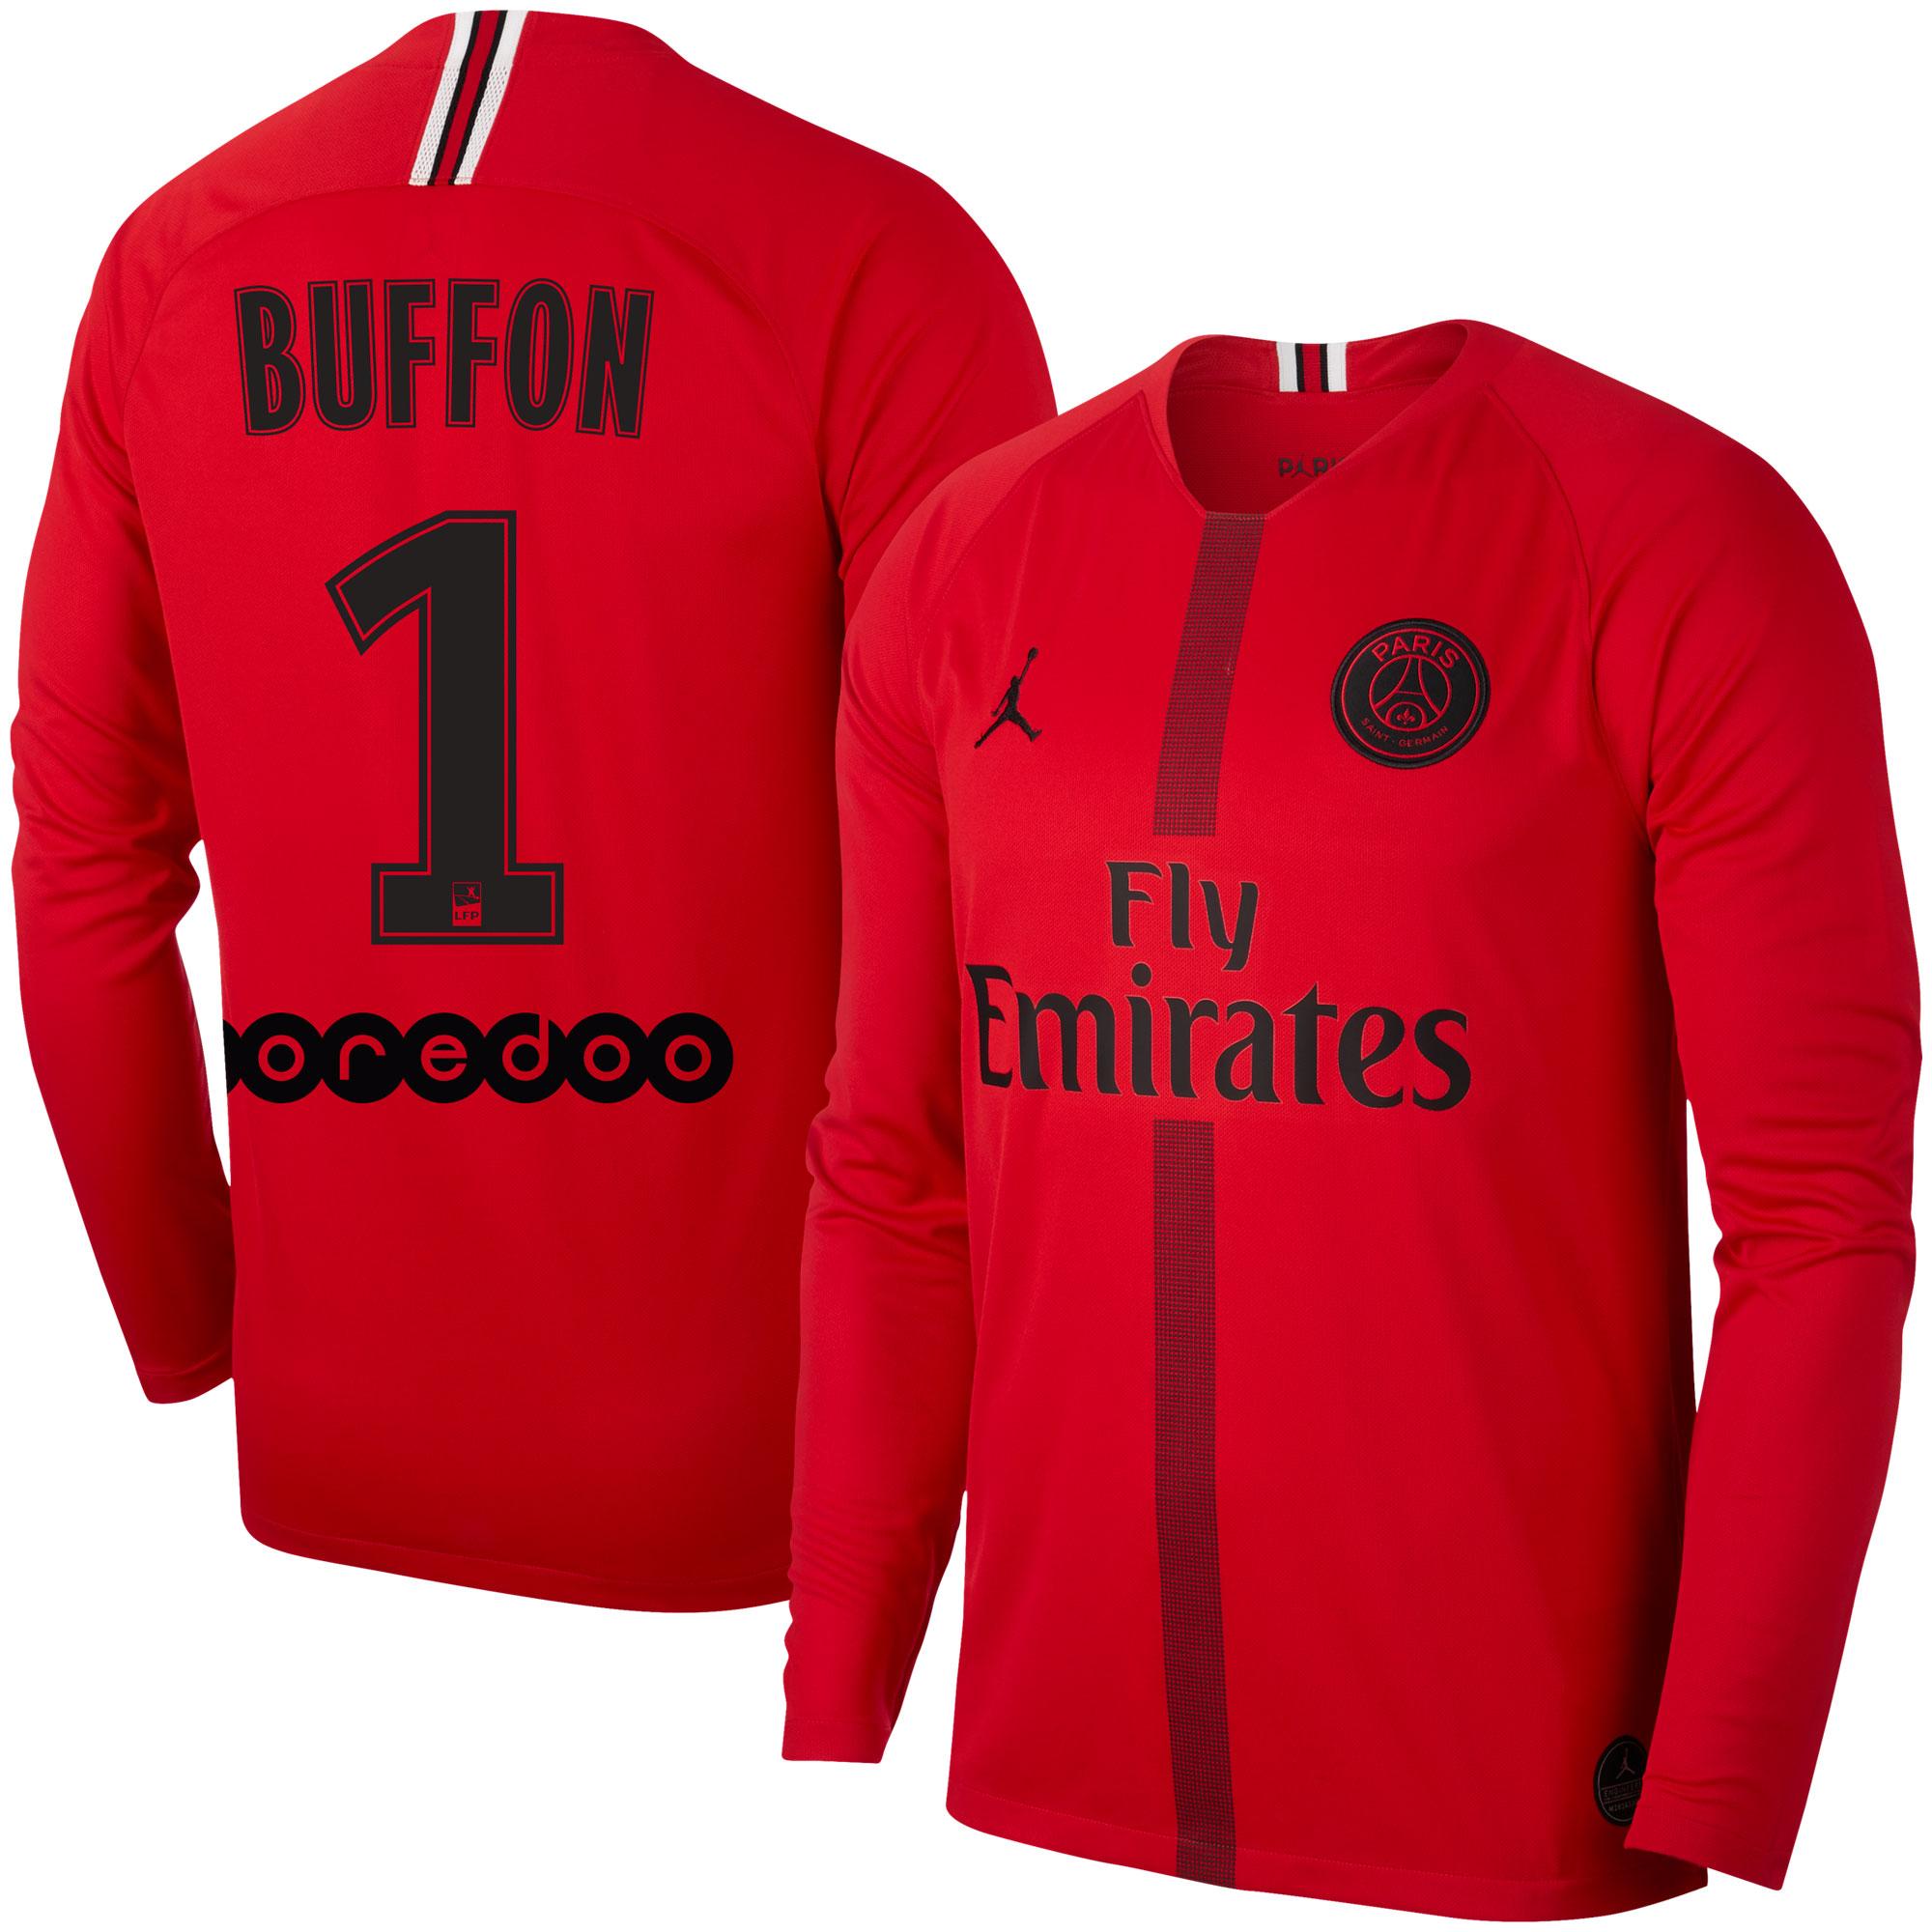 Paris Saint-Germain Goleiro camisa